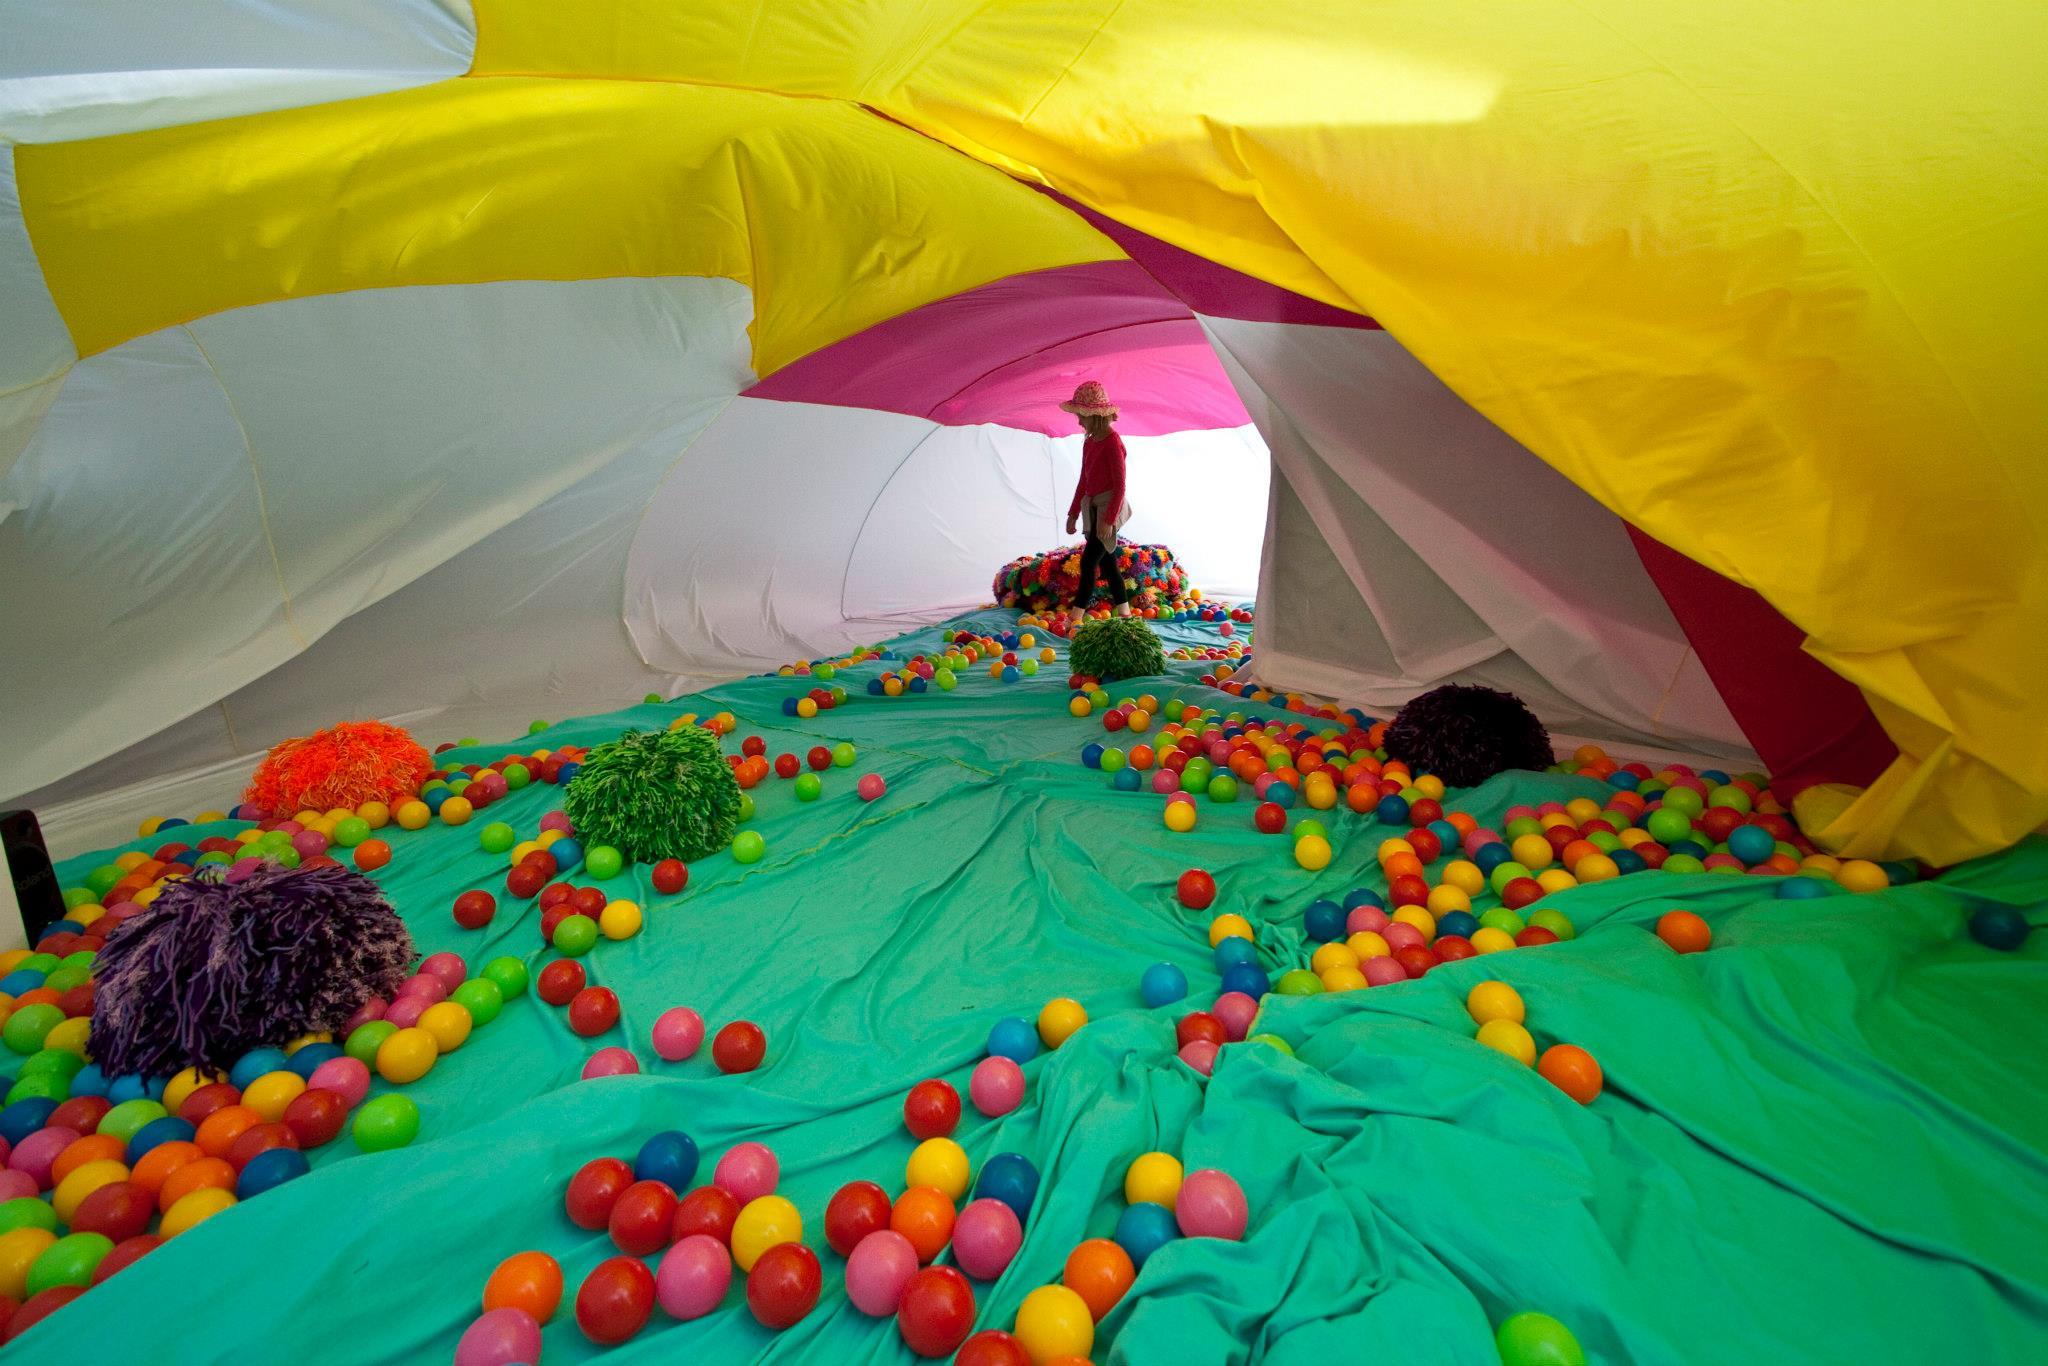 inflatable home.jpg